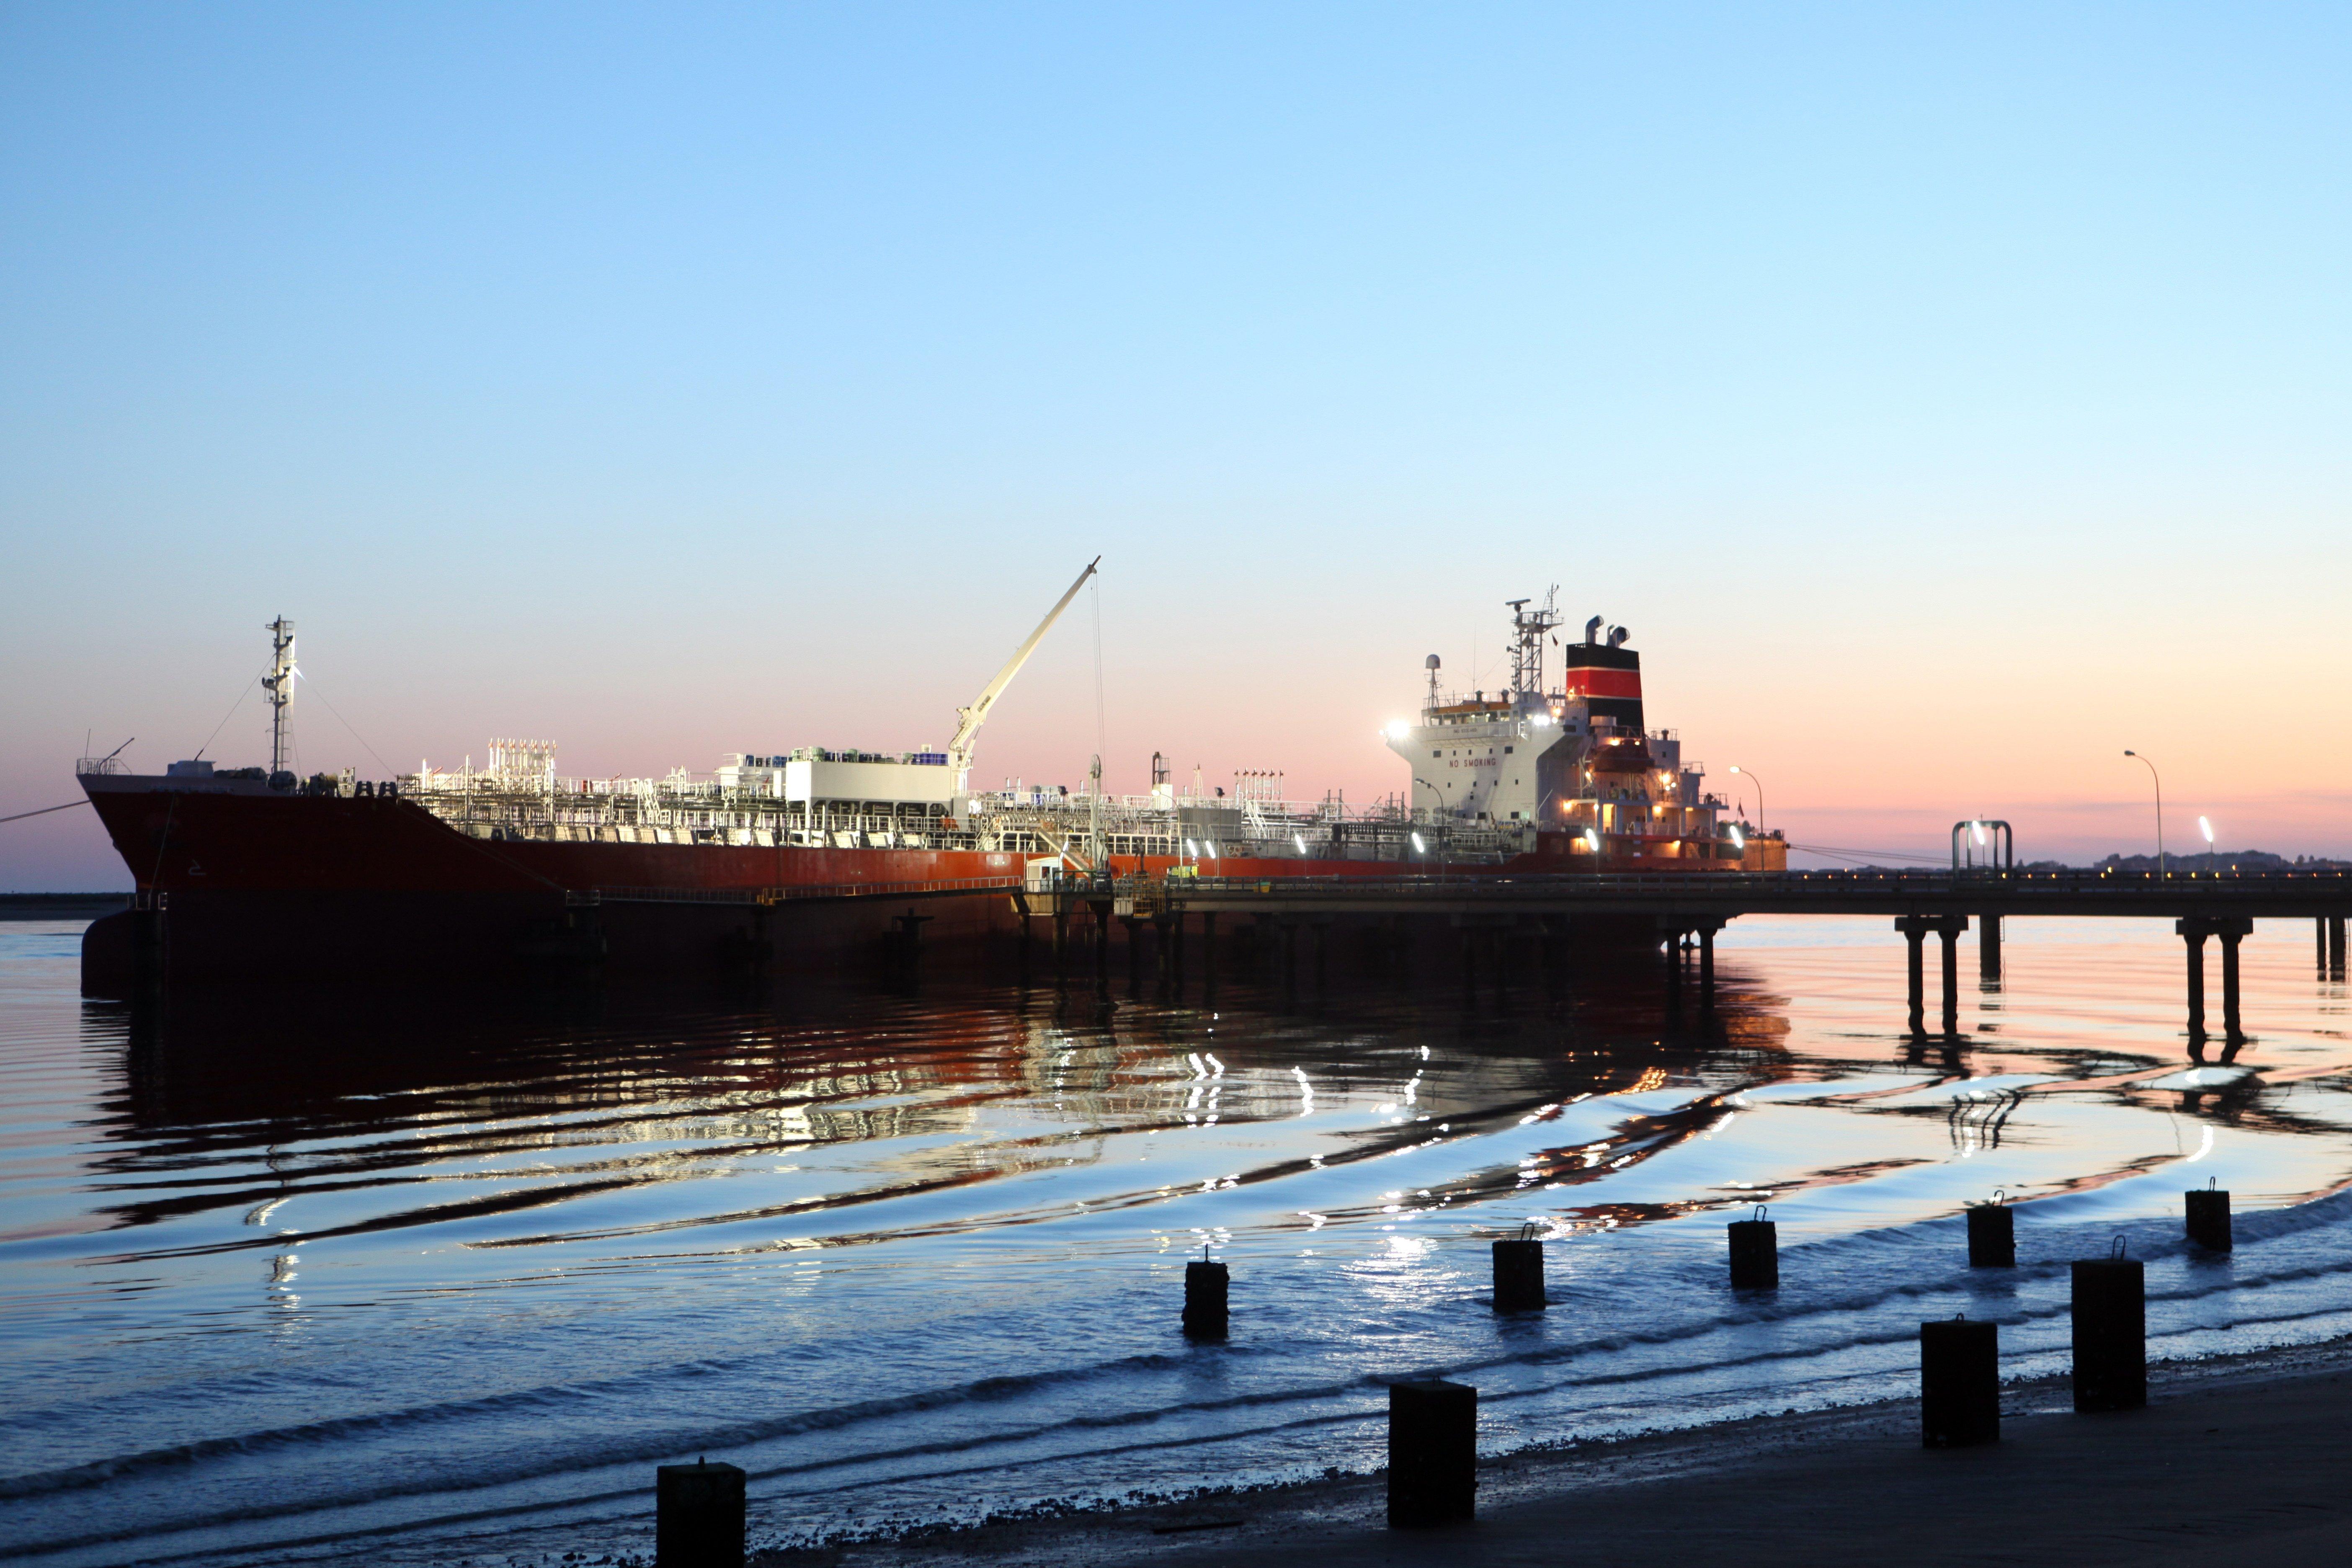 Declining oil price: geopolitics or just plain economics?